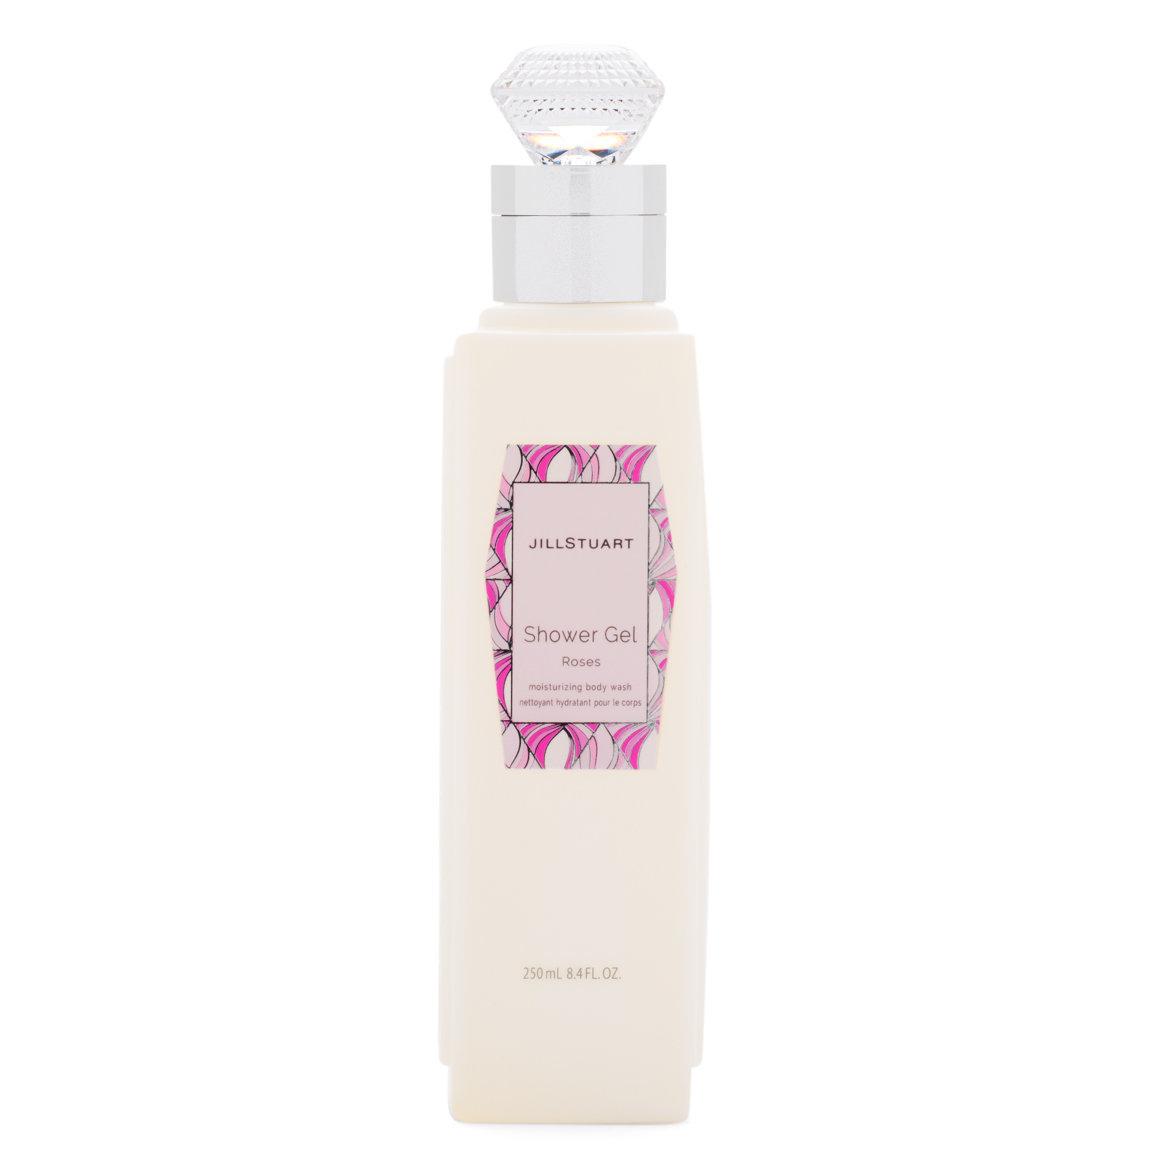 JILL STUART Beauty Shower Gel Roses alternative view 1 - product swatch.